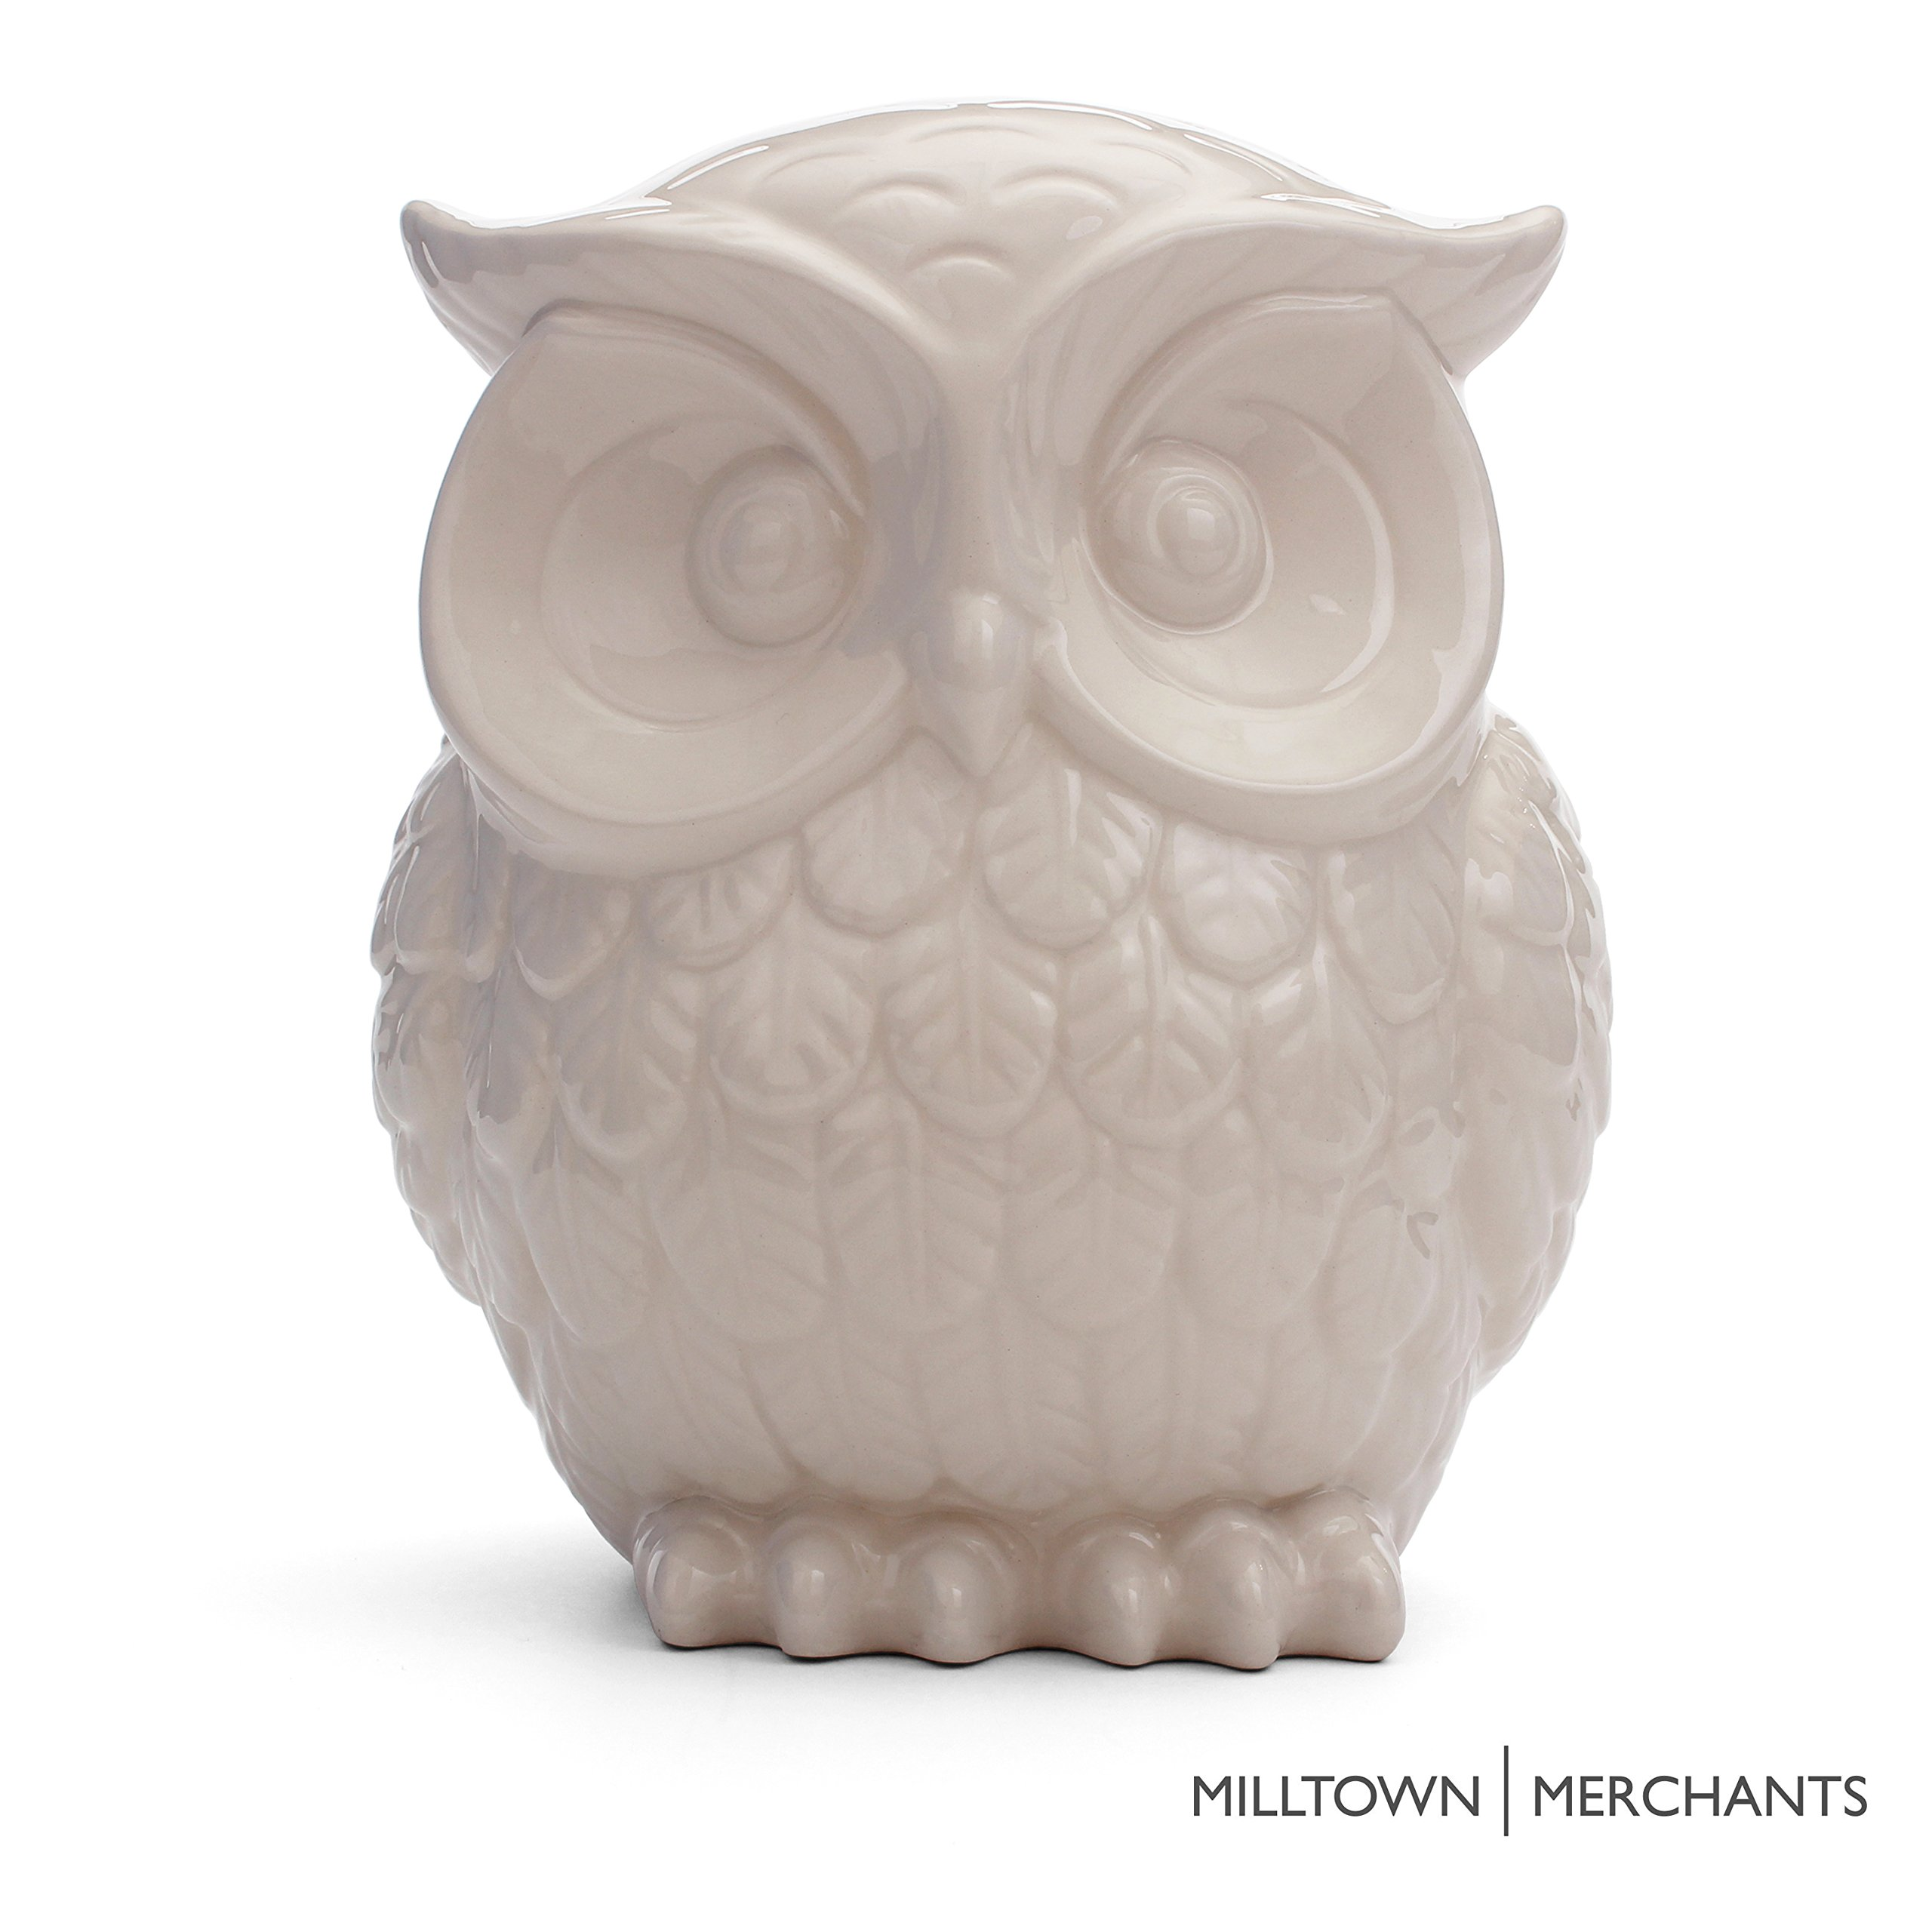 Milltown Merchants Trade Owl Figurine Ceramic Decor White